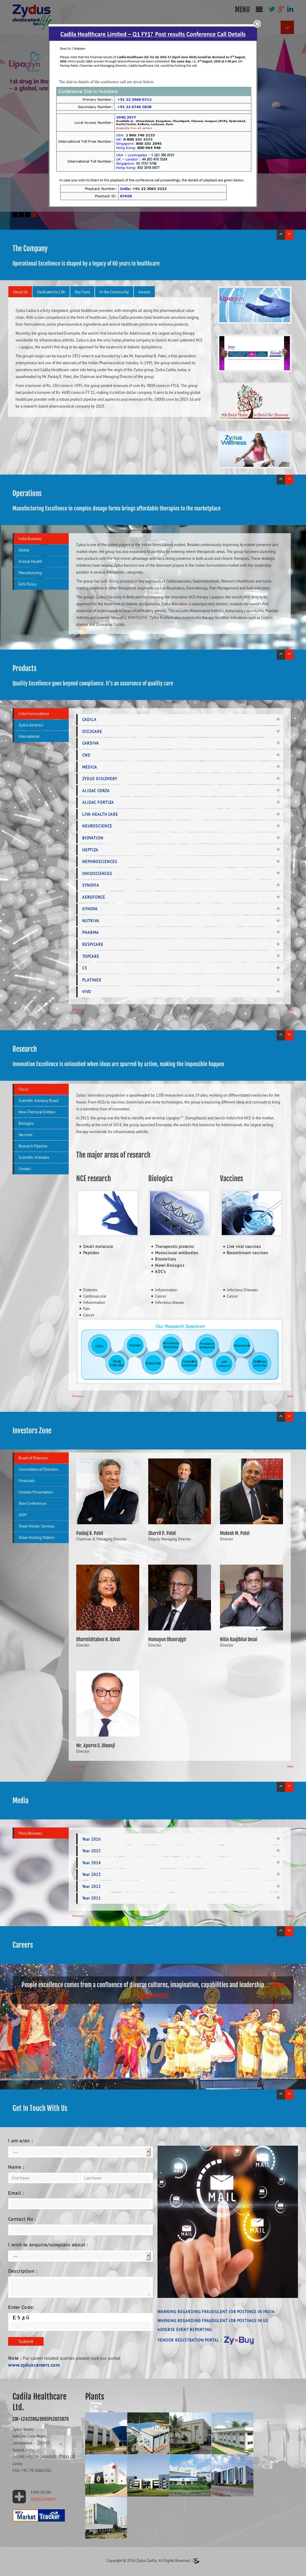 Zydus Cadila Competitors, Revenue and Employees - Owler Company Profile